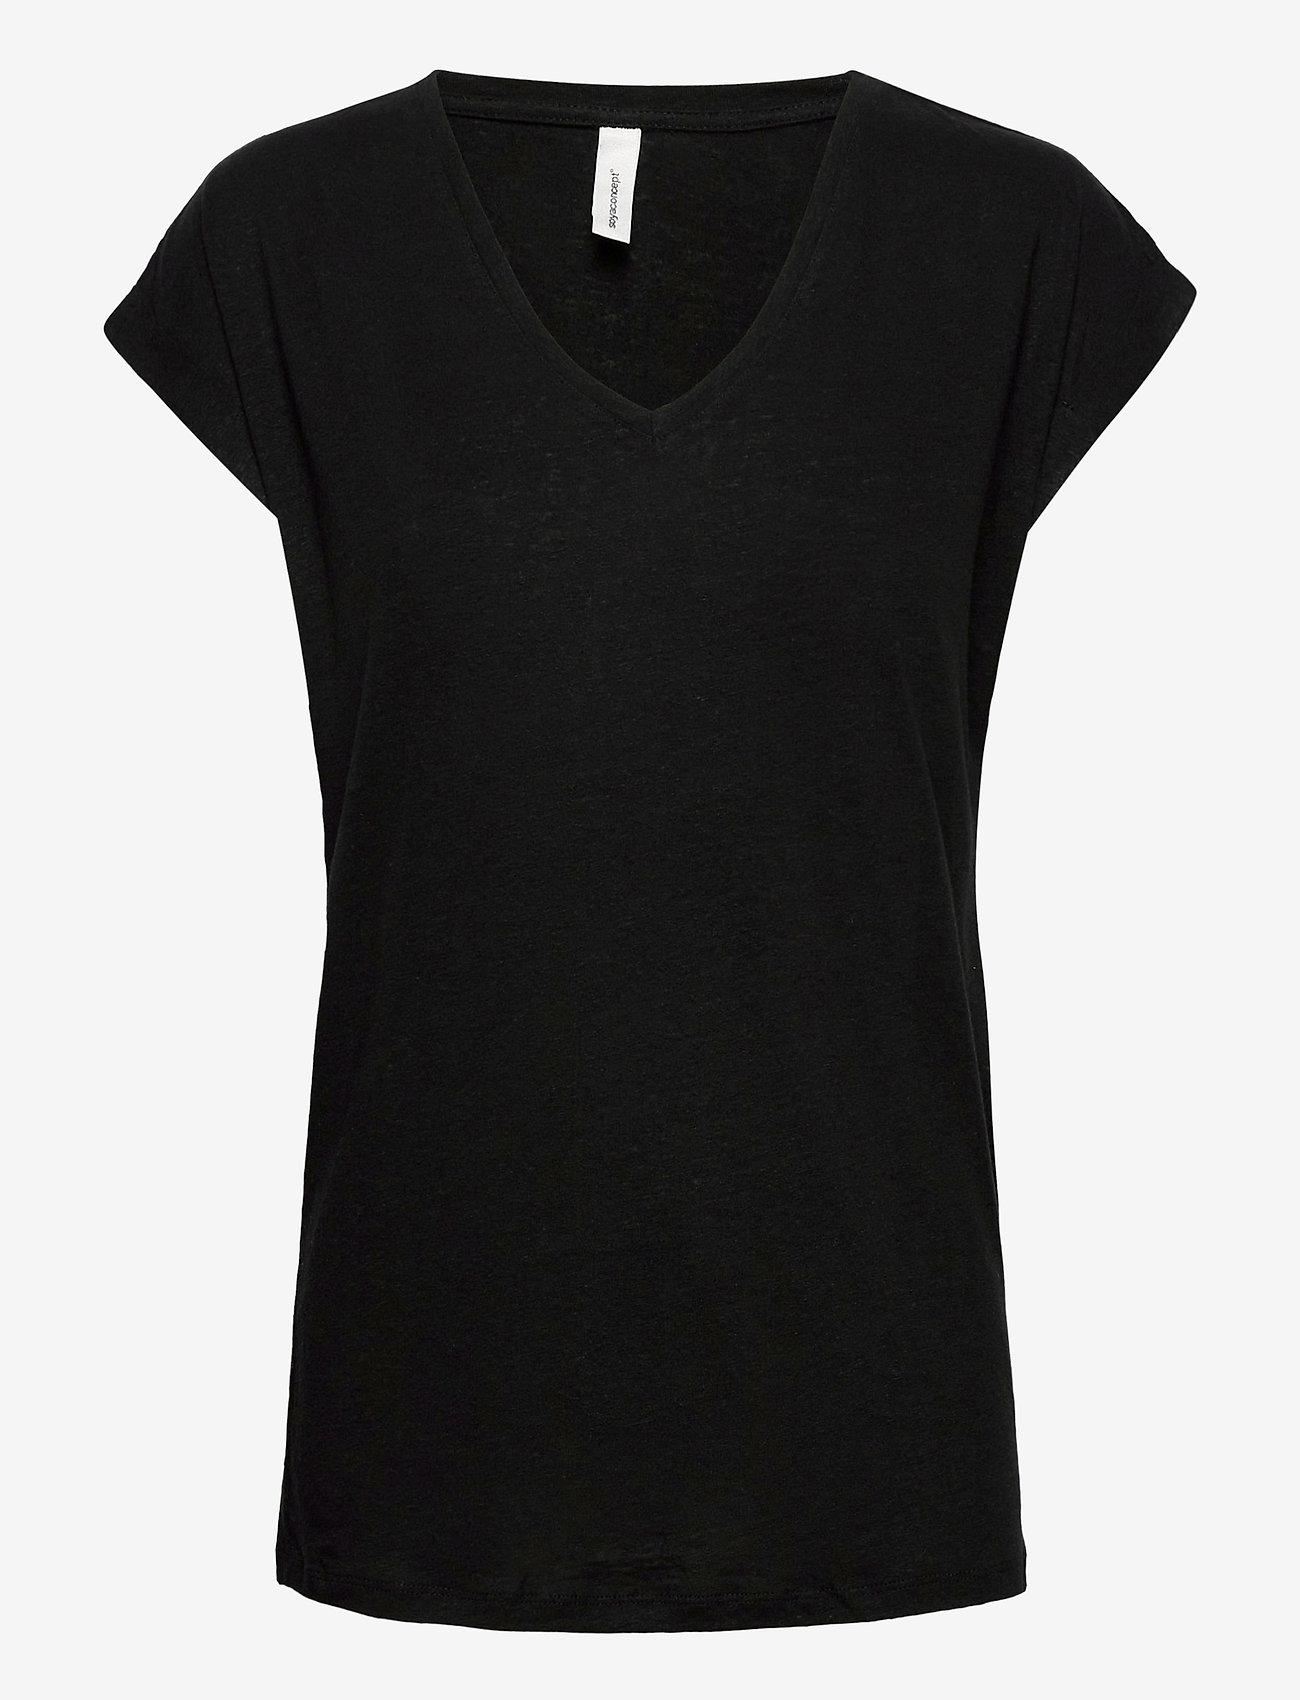 Soyaconcept - SC-ISABEL - t-shirts - black - 0